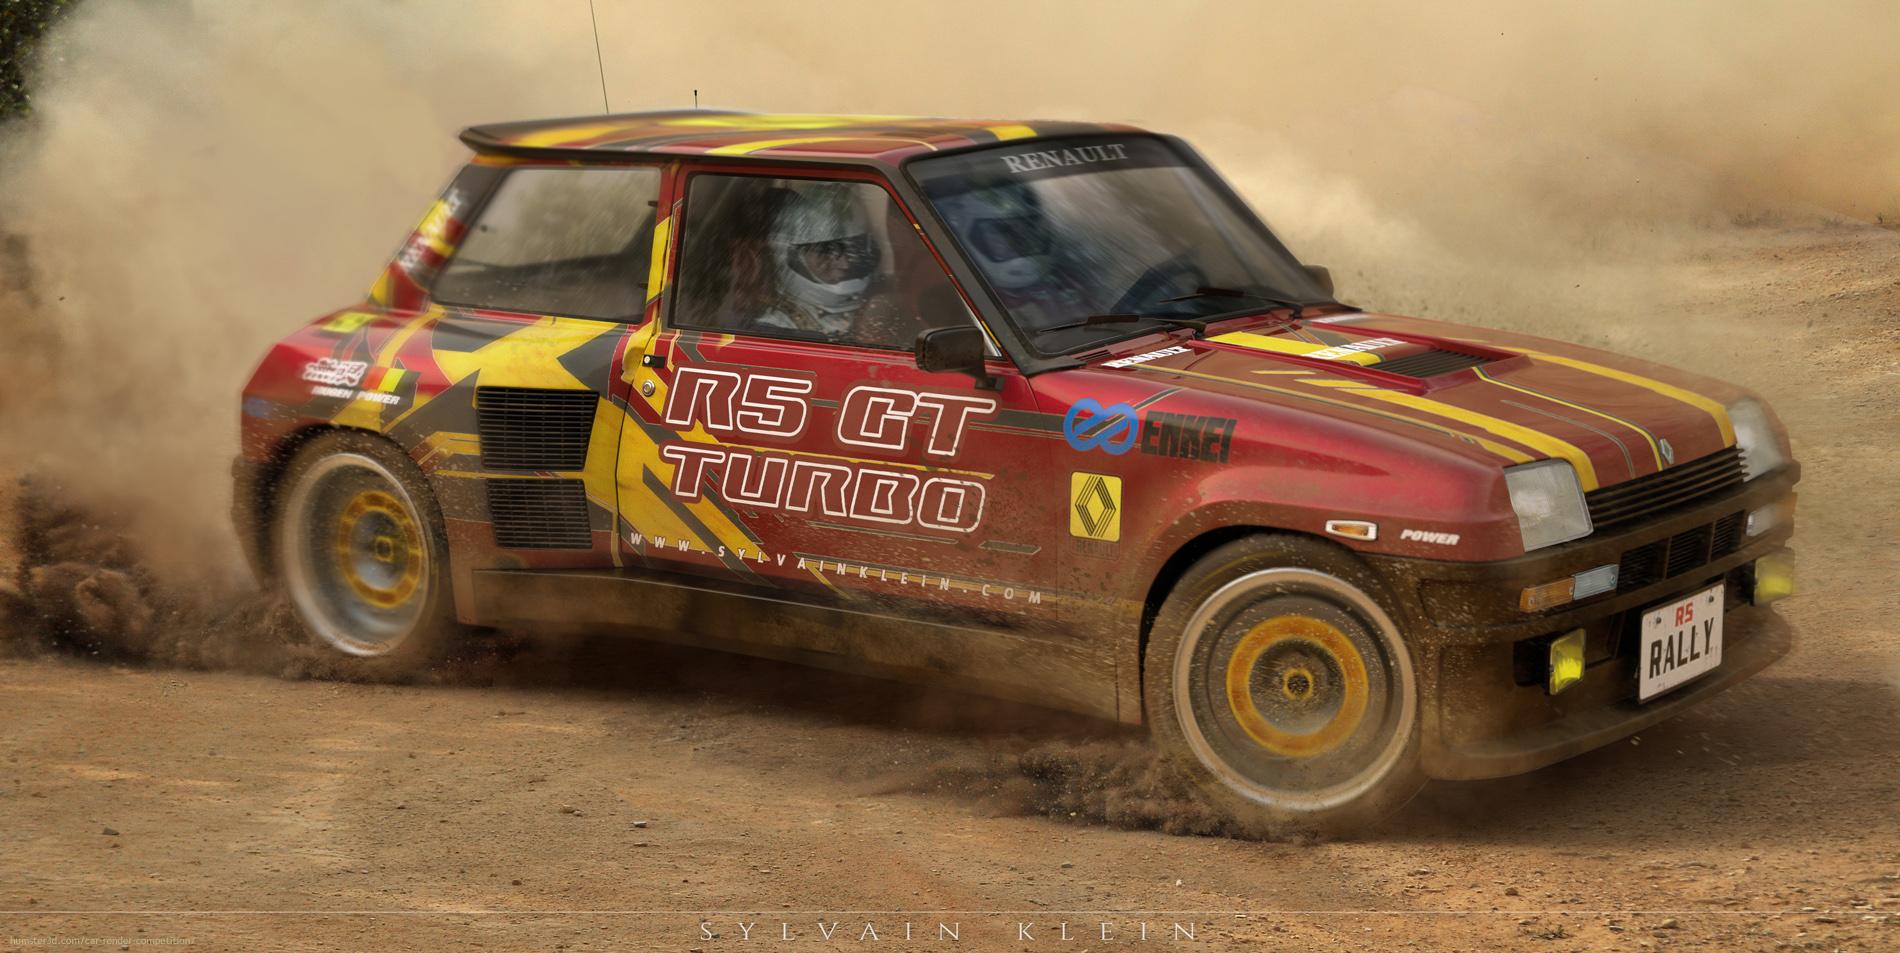 R5 GT Turbo